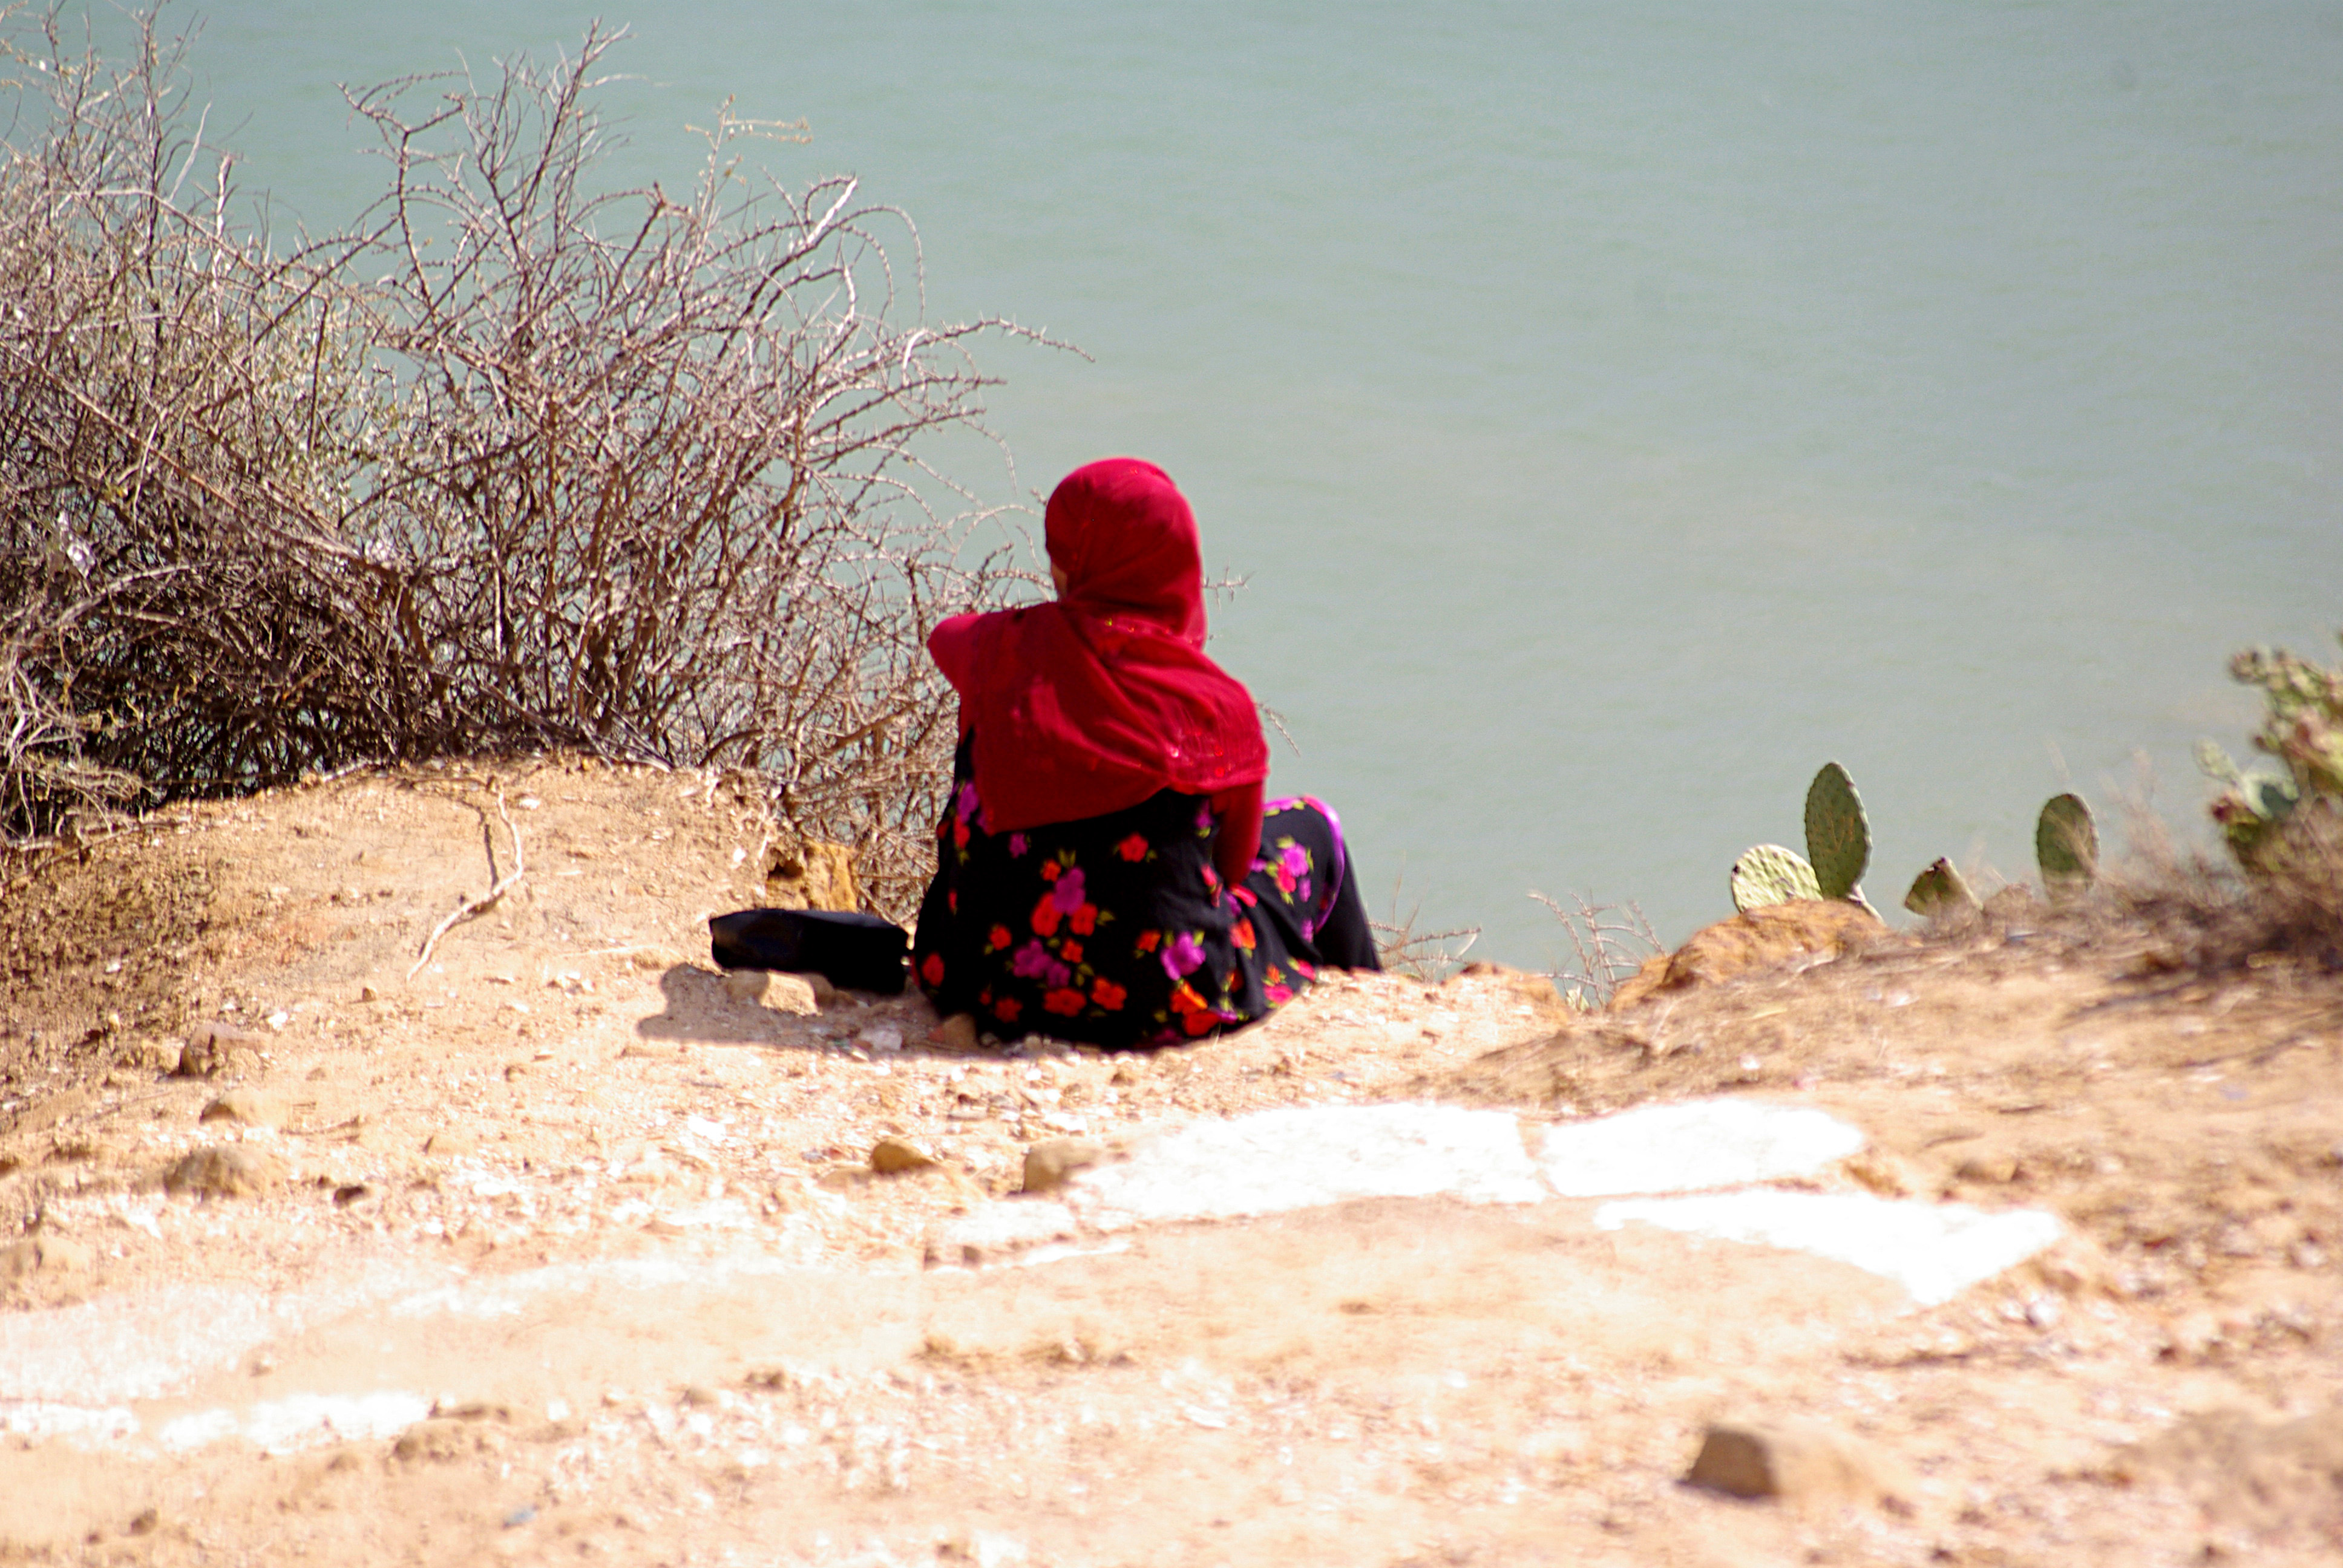 http://loudianou.free.fr/10/vac/TUNISIE/Sirene%20(2).jpg